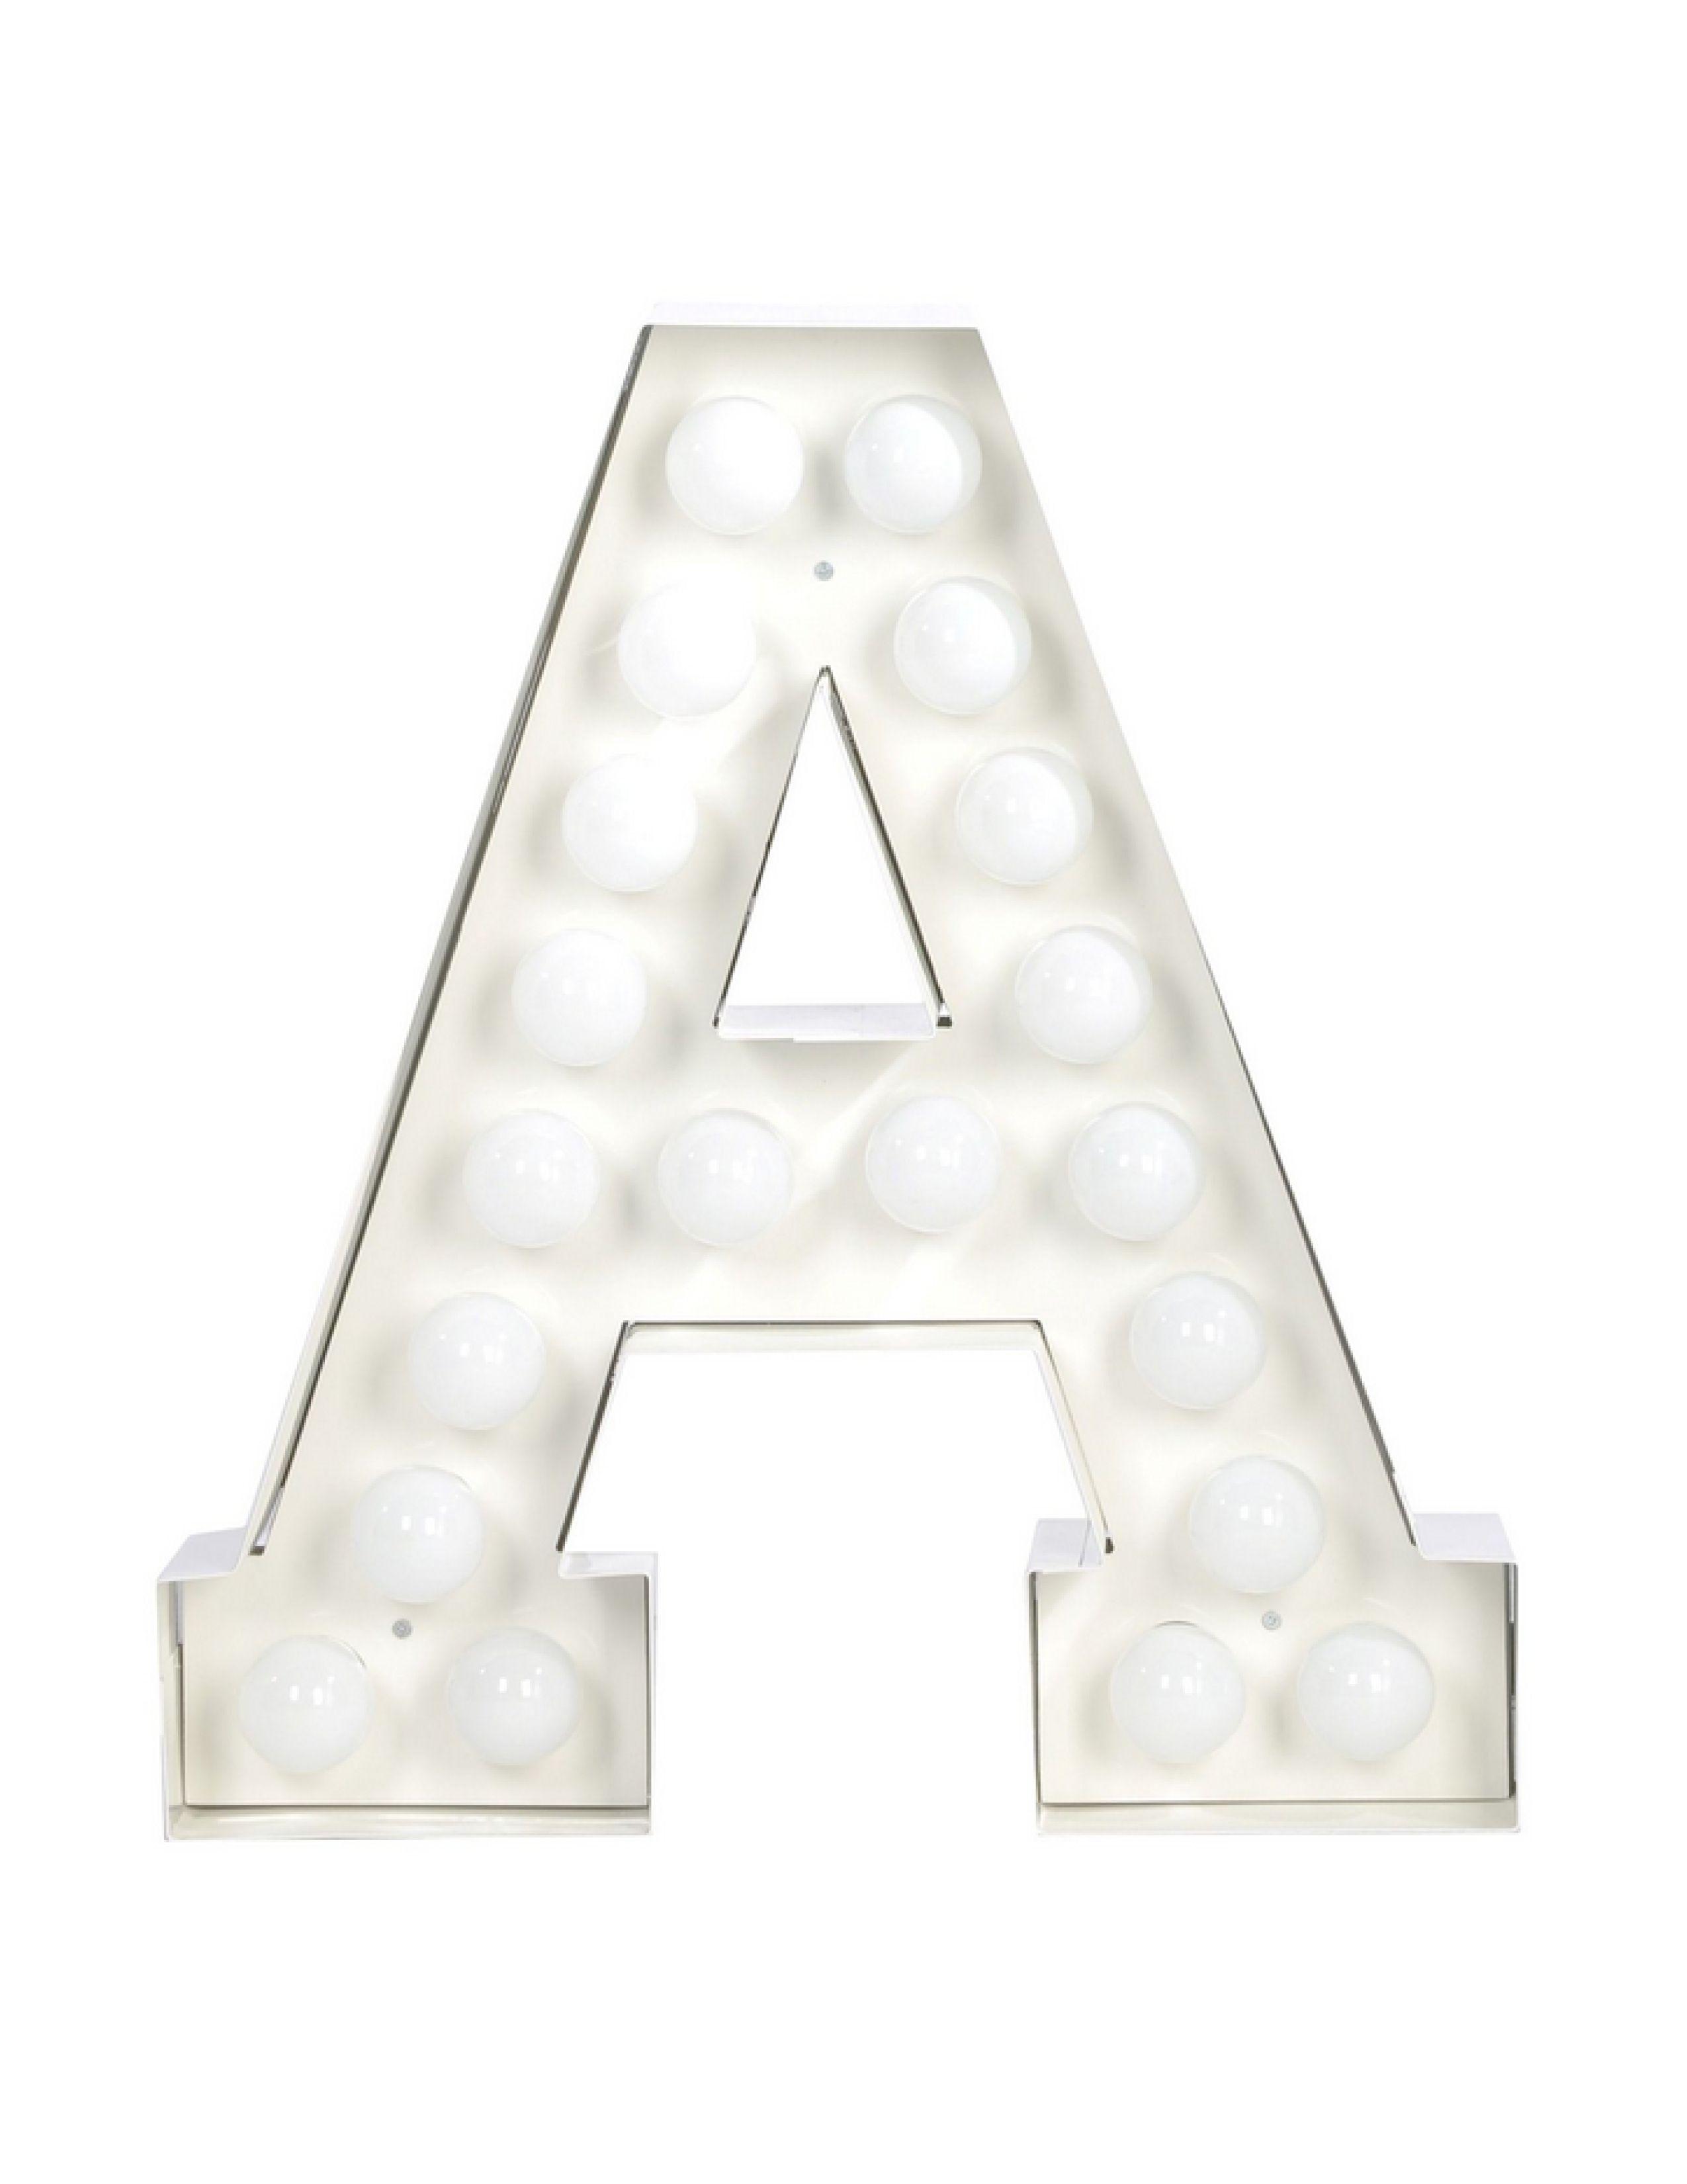 Seletti VEGAZ LED verlichting A